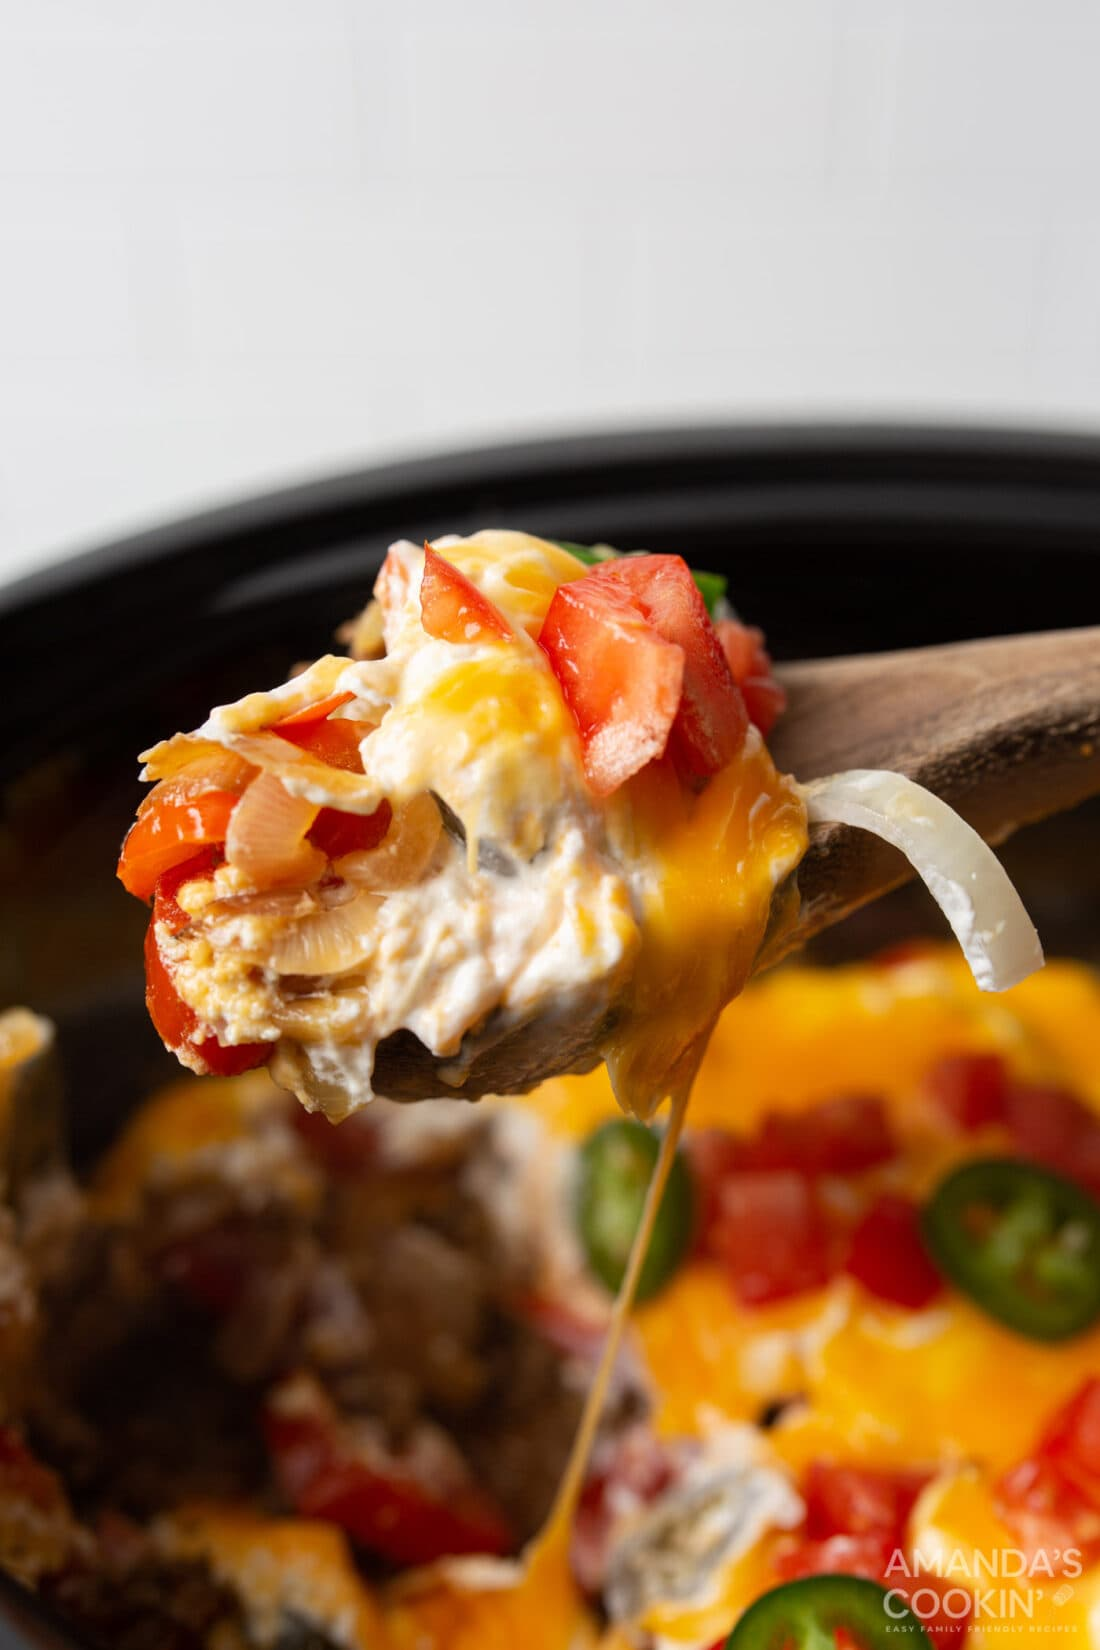 serving spoon of crockpot john wayne casserole